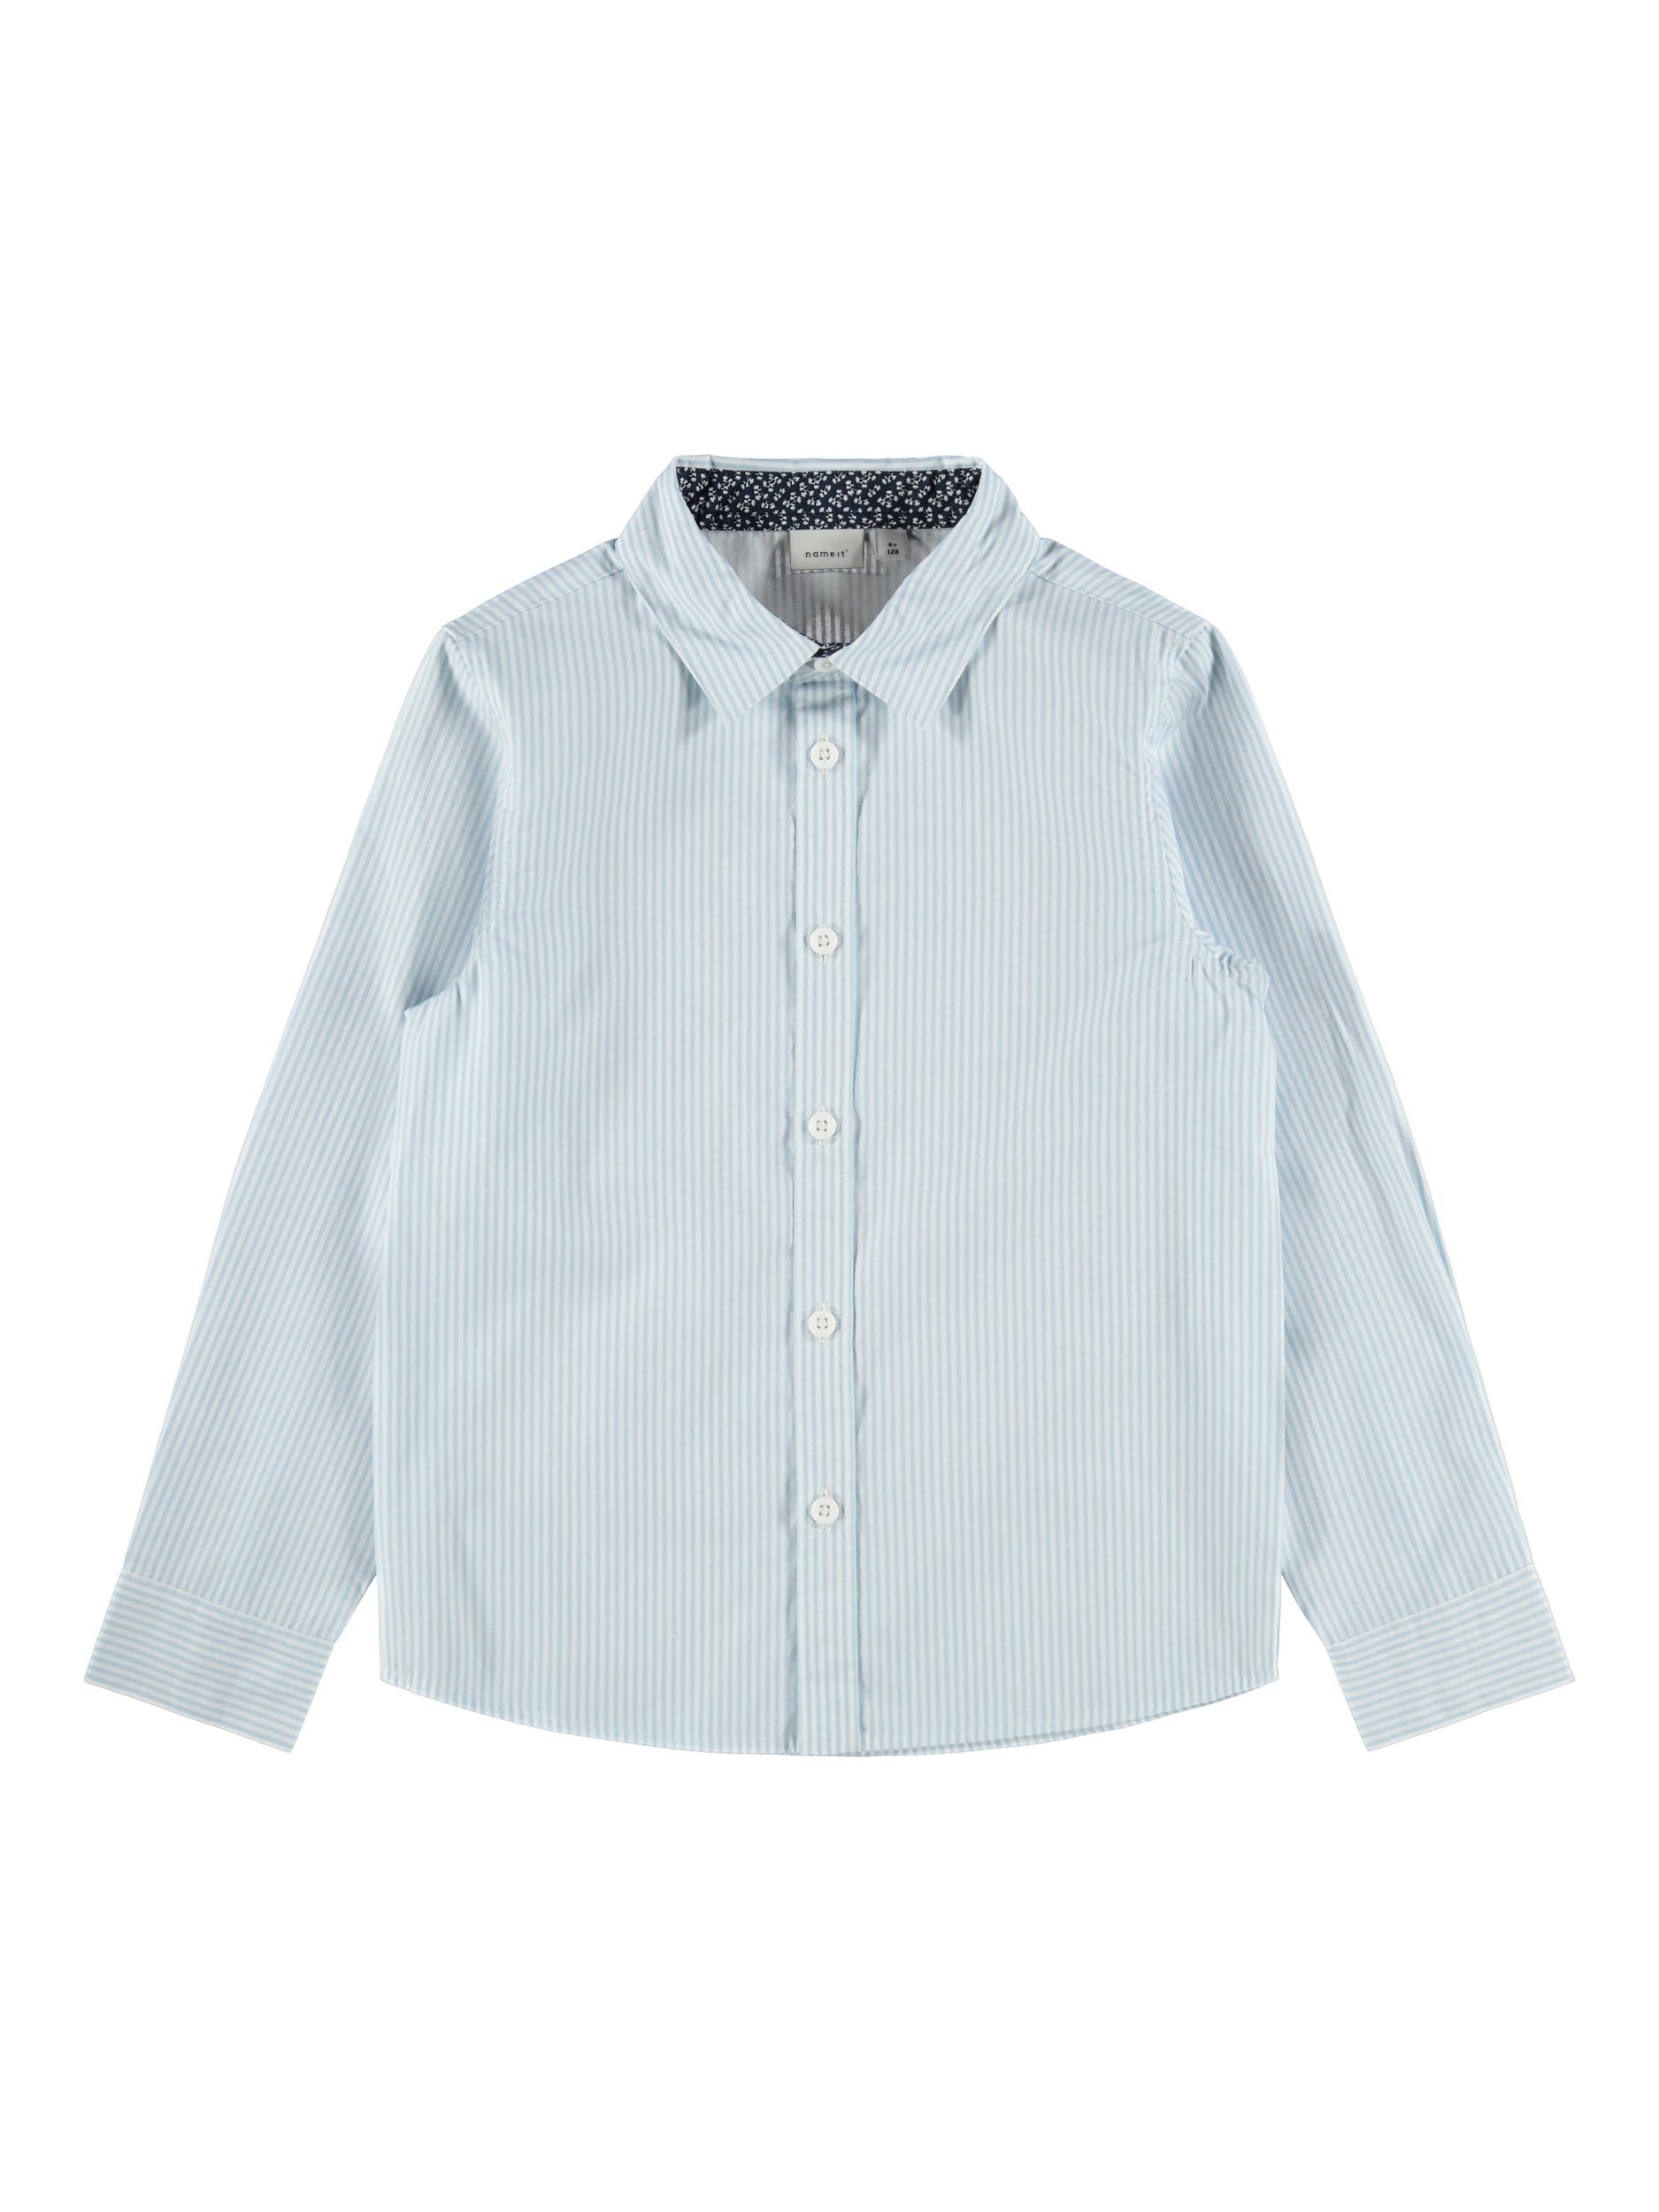 Name It Raki skjorte, Skyway, 122-128